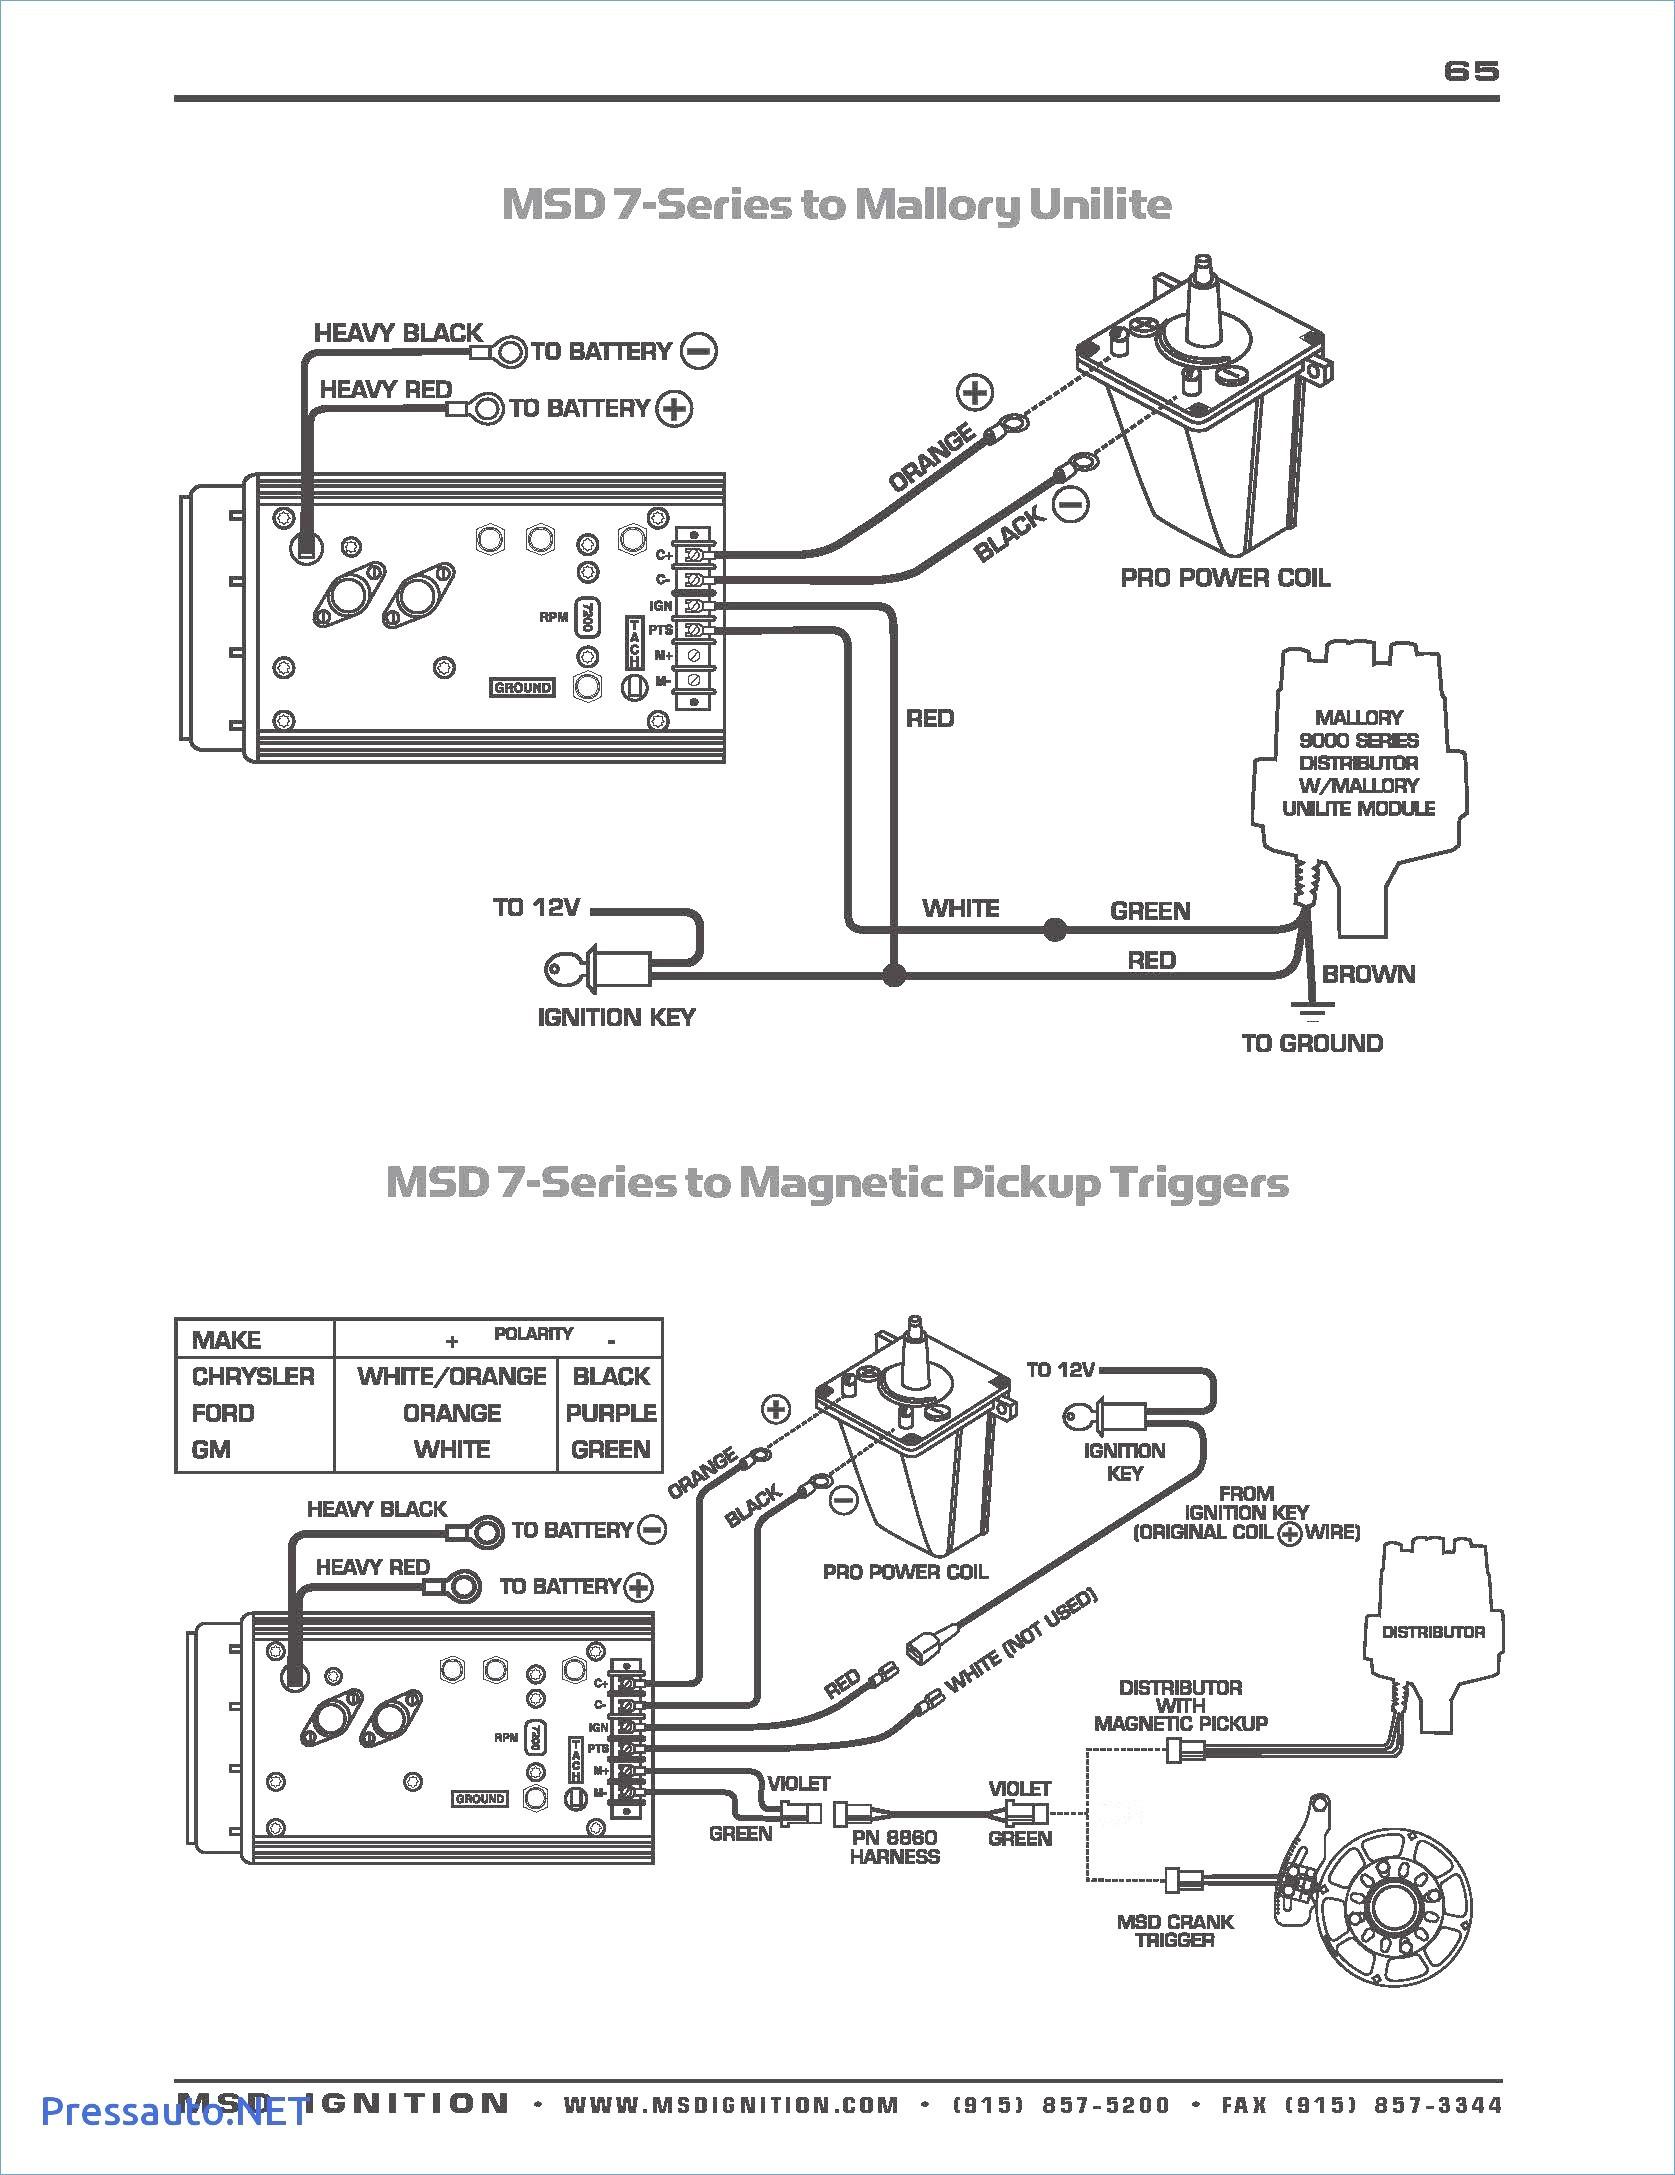 4 Wire Ignition Switch Diagram Atv : ignition, switch, diagram, DIAGRAM], Kubota, Ignition, Switch, Wiring, Diagram, Version, Quality, BEADINGDIAGRAMS.CAPPADOCIAWEB.IT